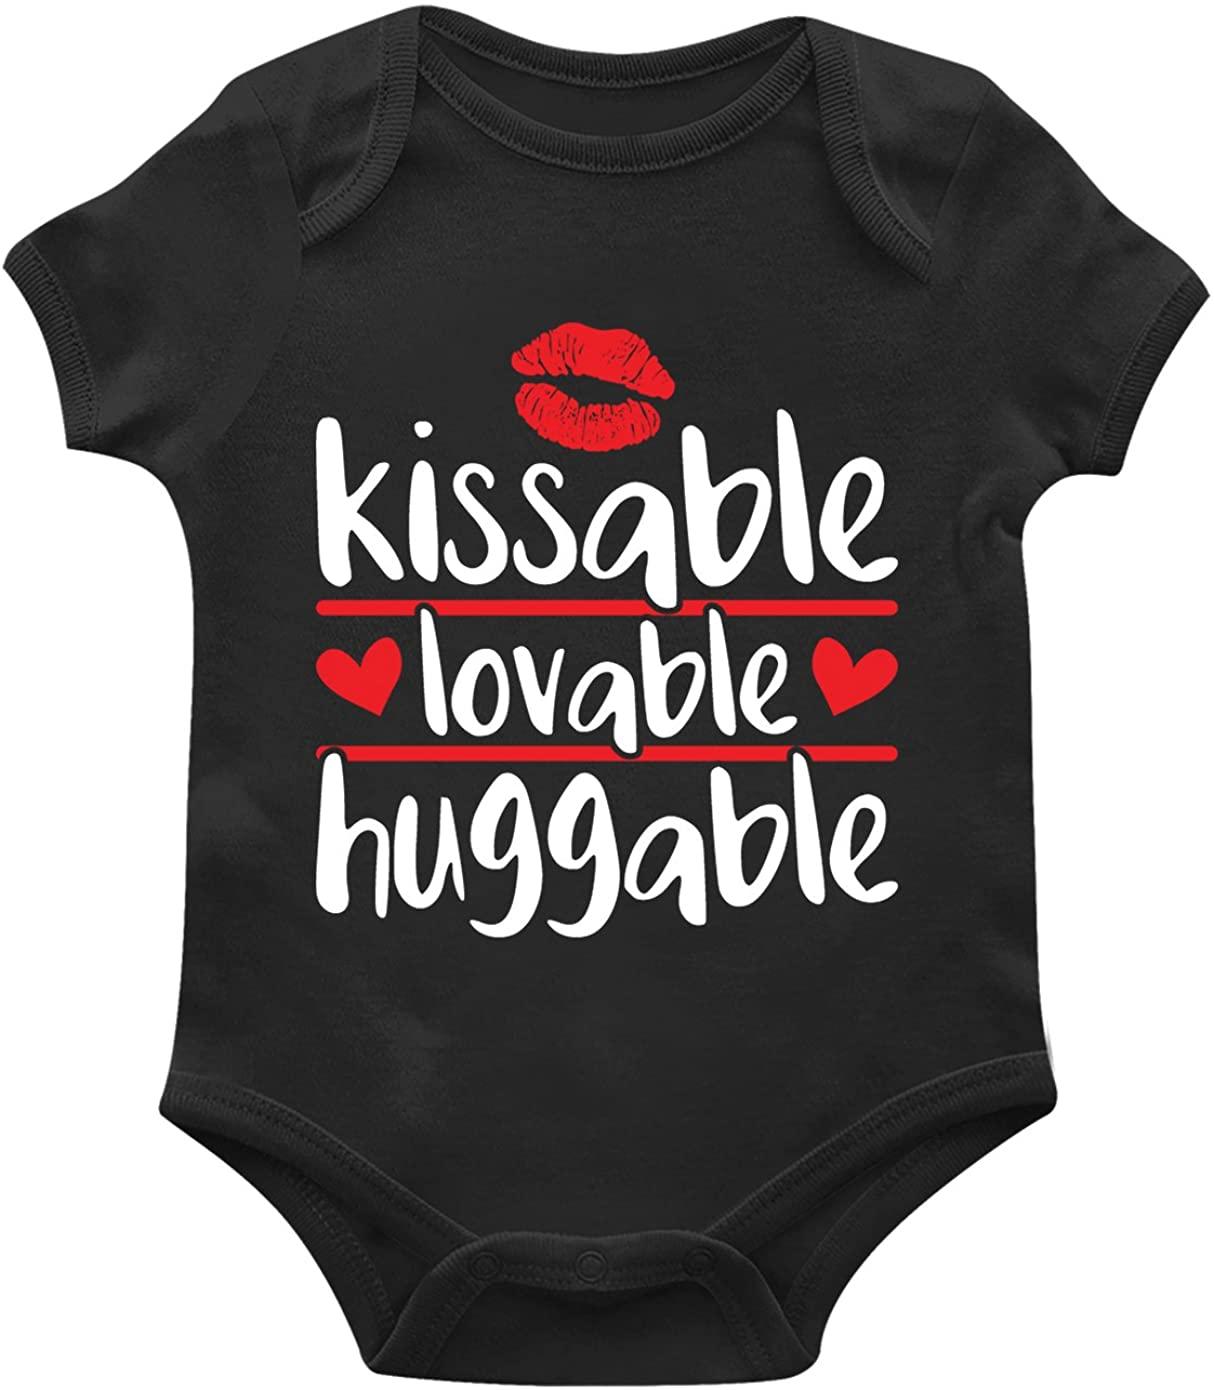 SpiritForged Apparel Kissable Lovable Huggable Infant Bodysuit